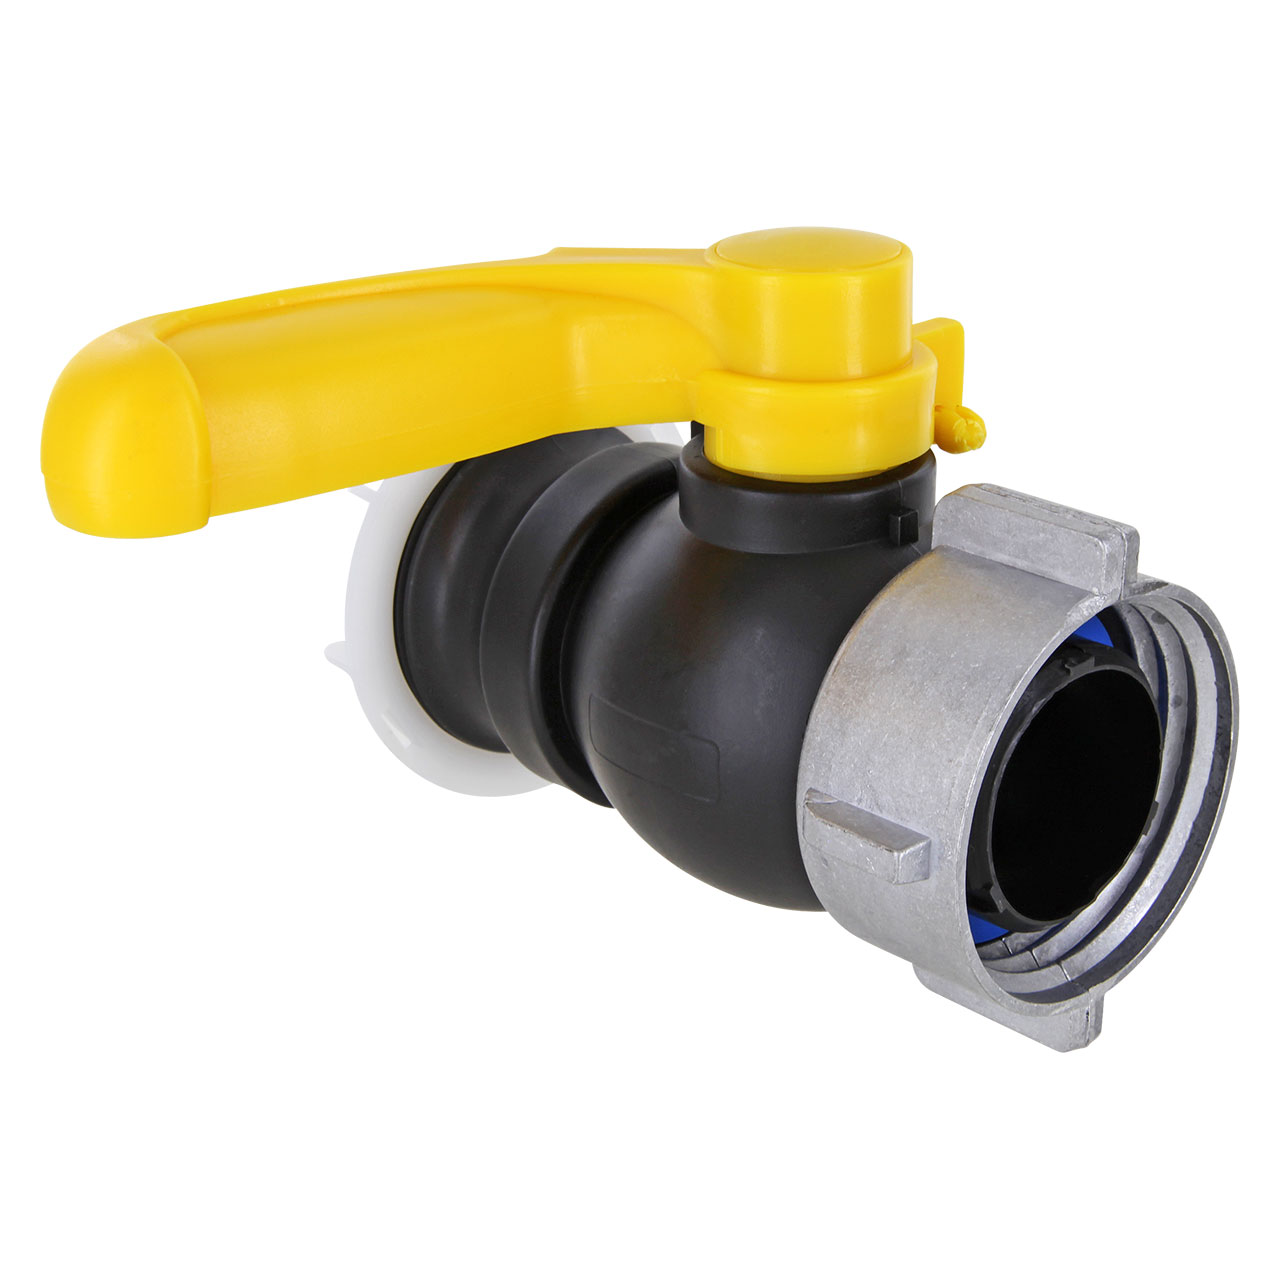 "3//4/"" IBC Adapter 60mm Regenwasser -Wassertank Anschluss S60x6 Wasserfass"